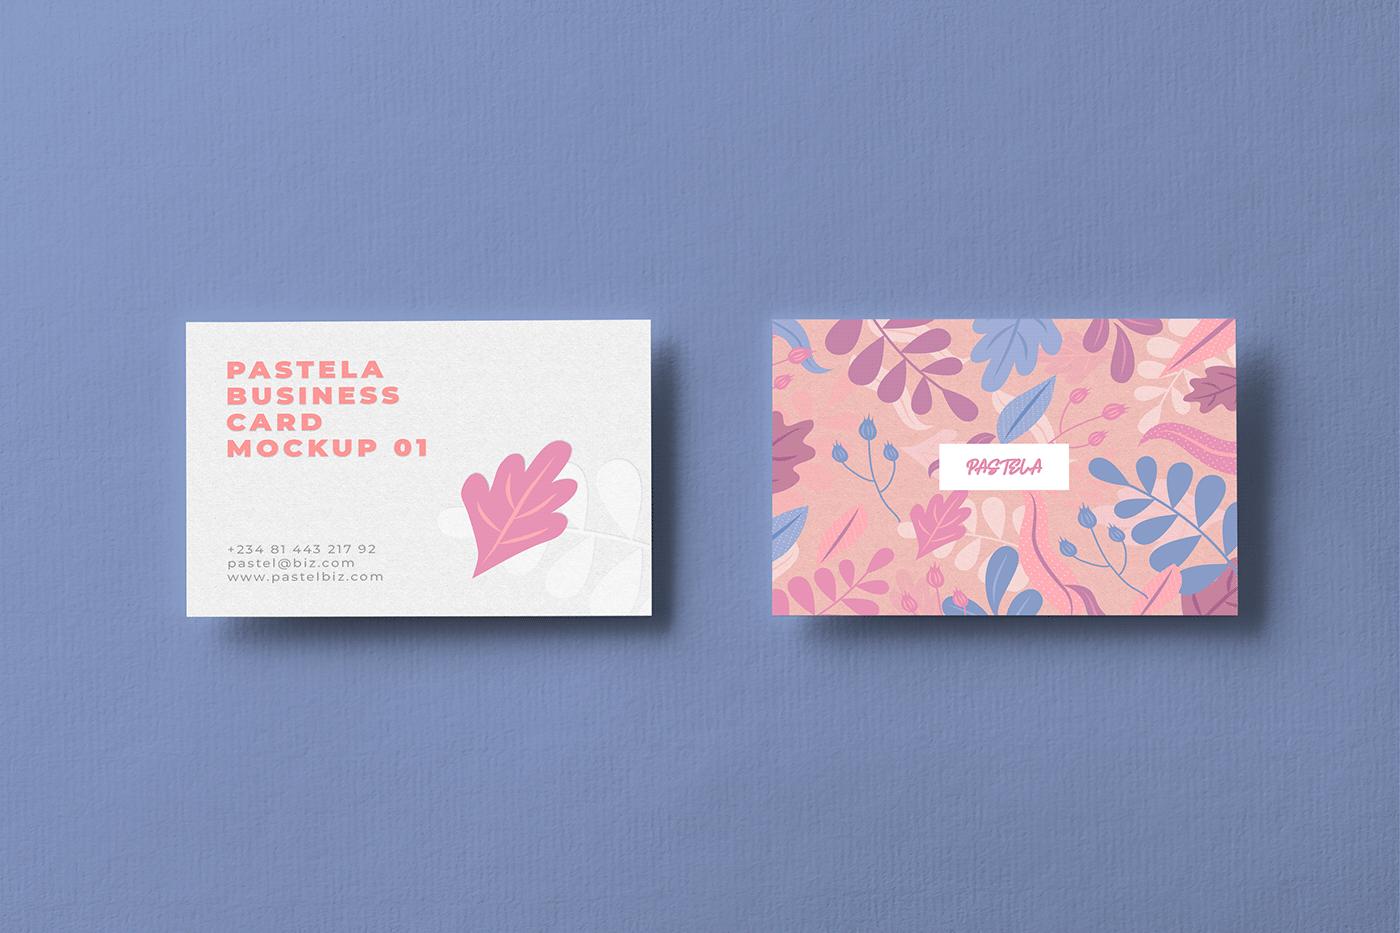 beautiful designs Branding Mockups business card Floral design free business card free download Free Mockups freebies mockups print template